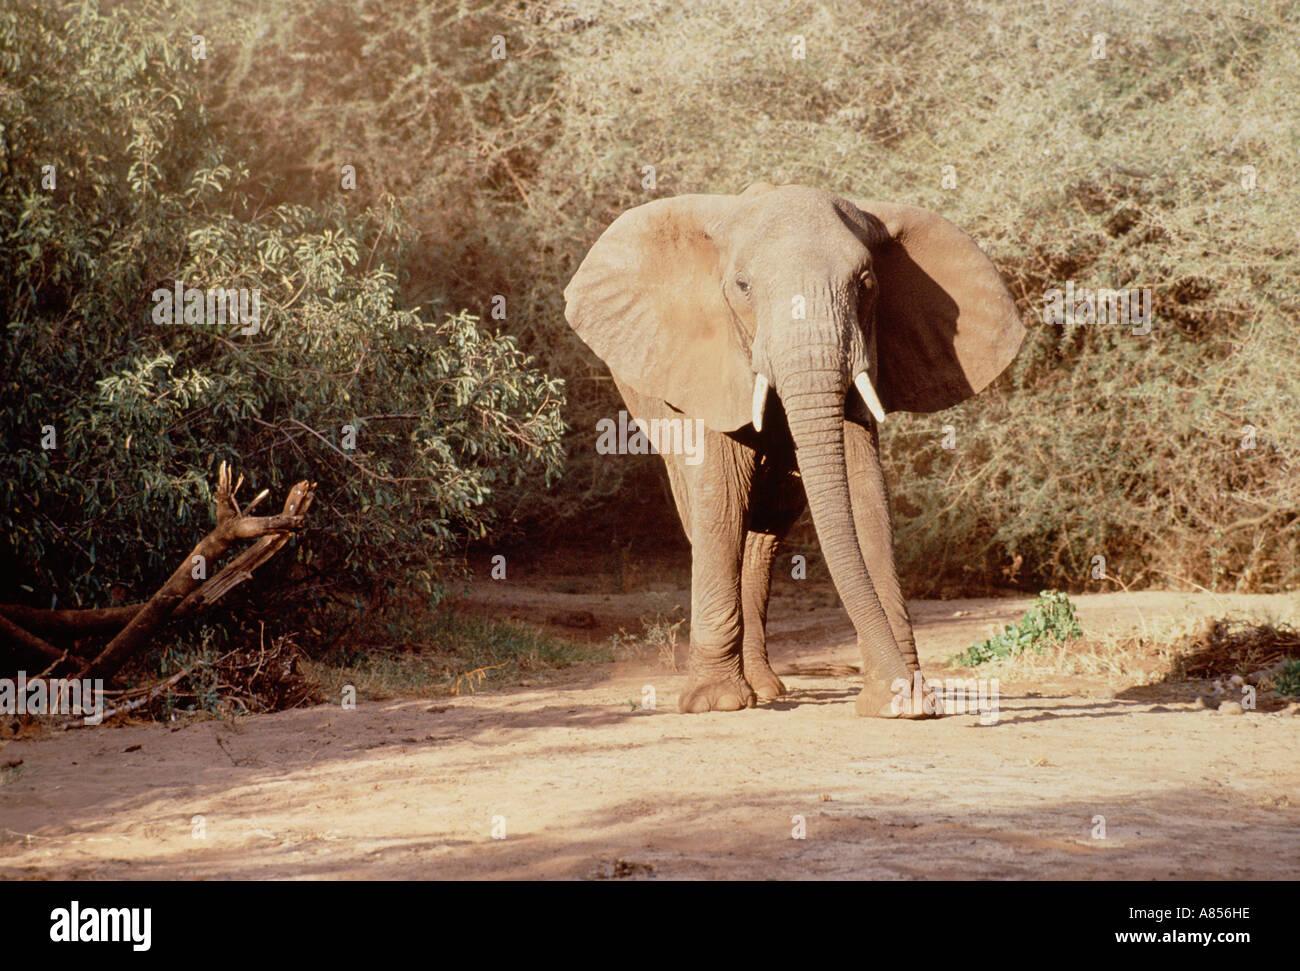 Tanzania. Lake Manyara National Park. African Elephant. - Stock Image